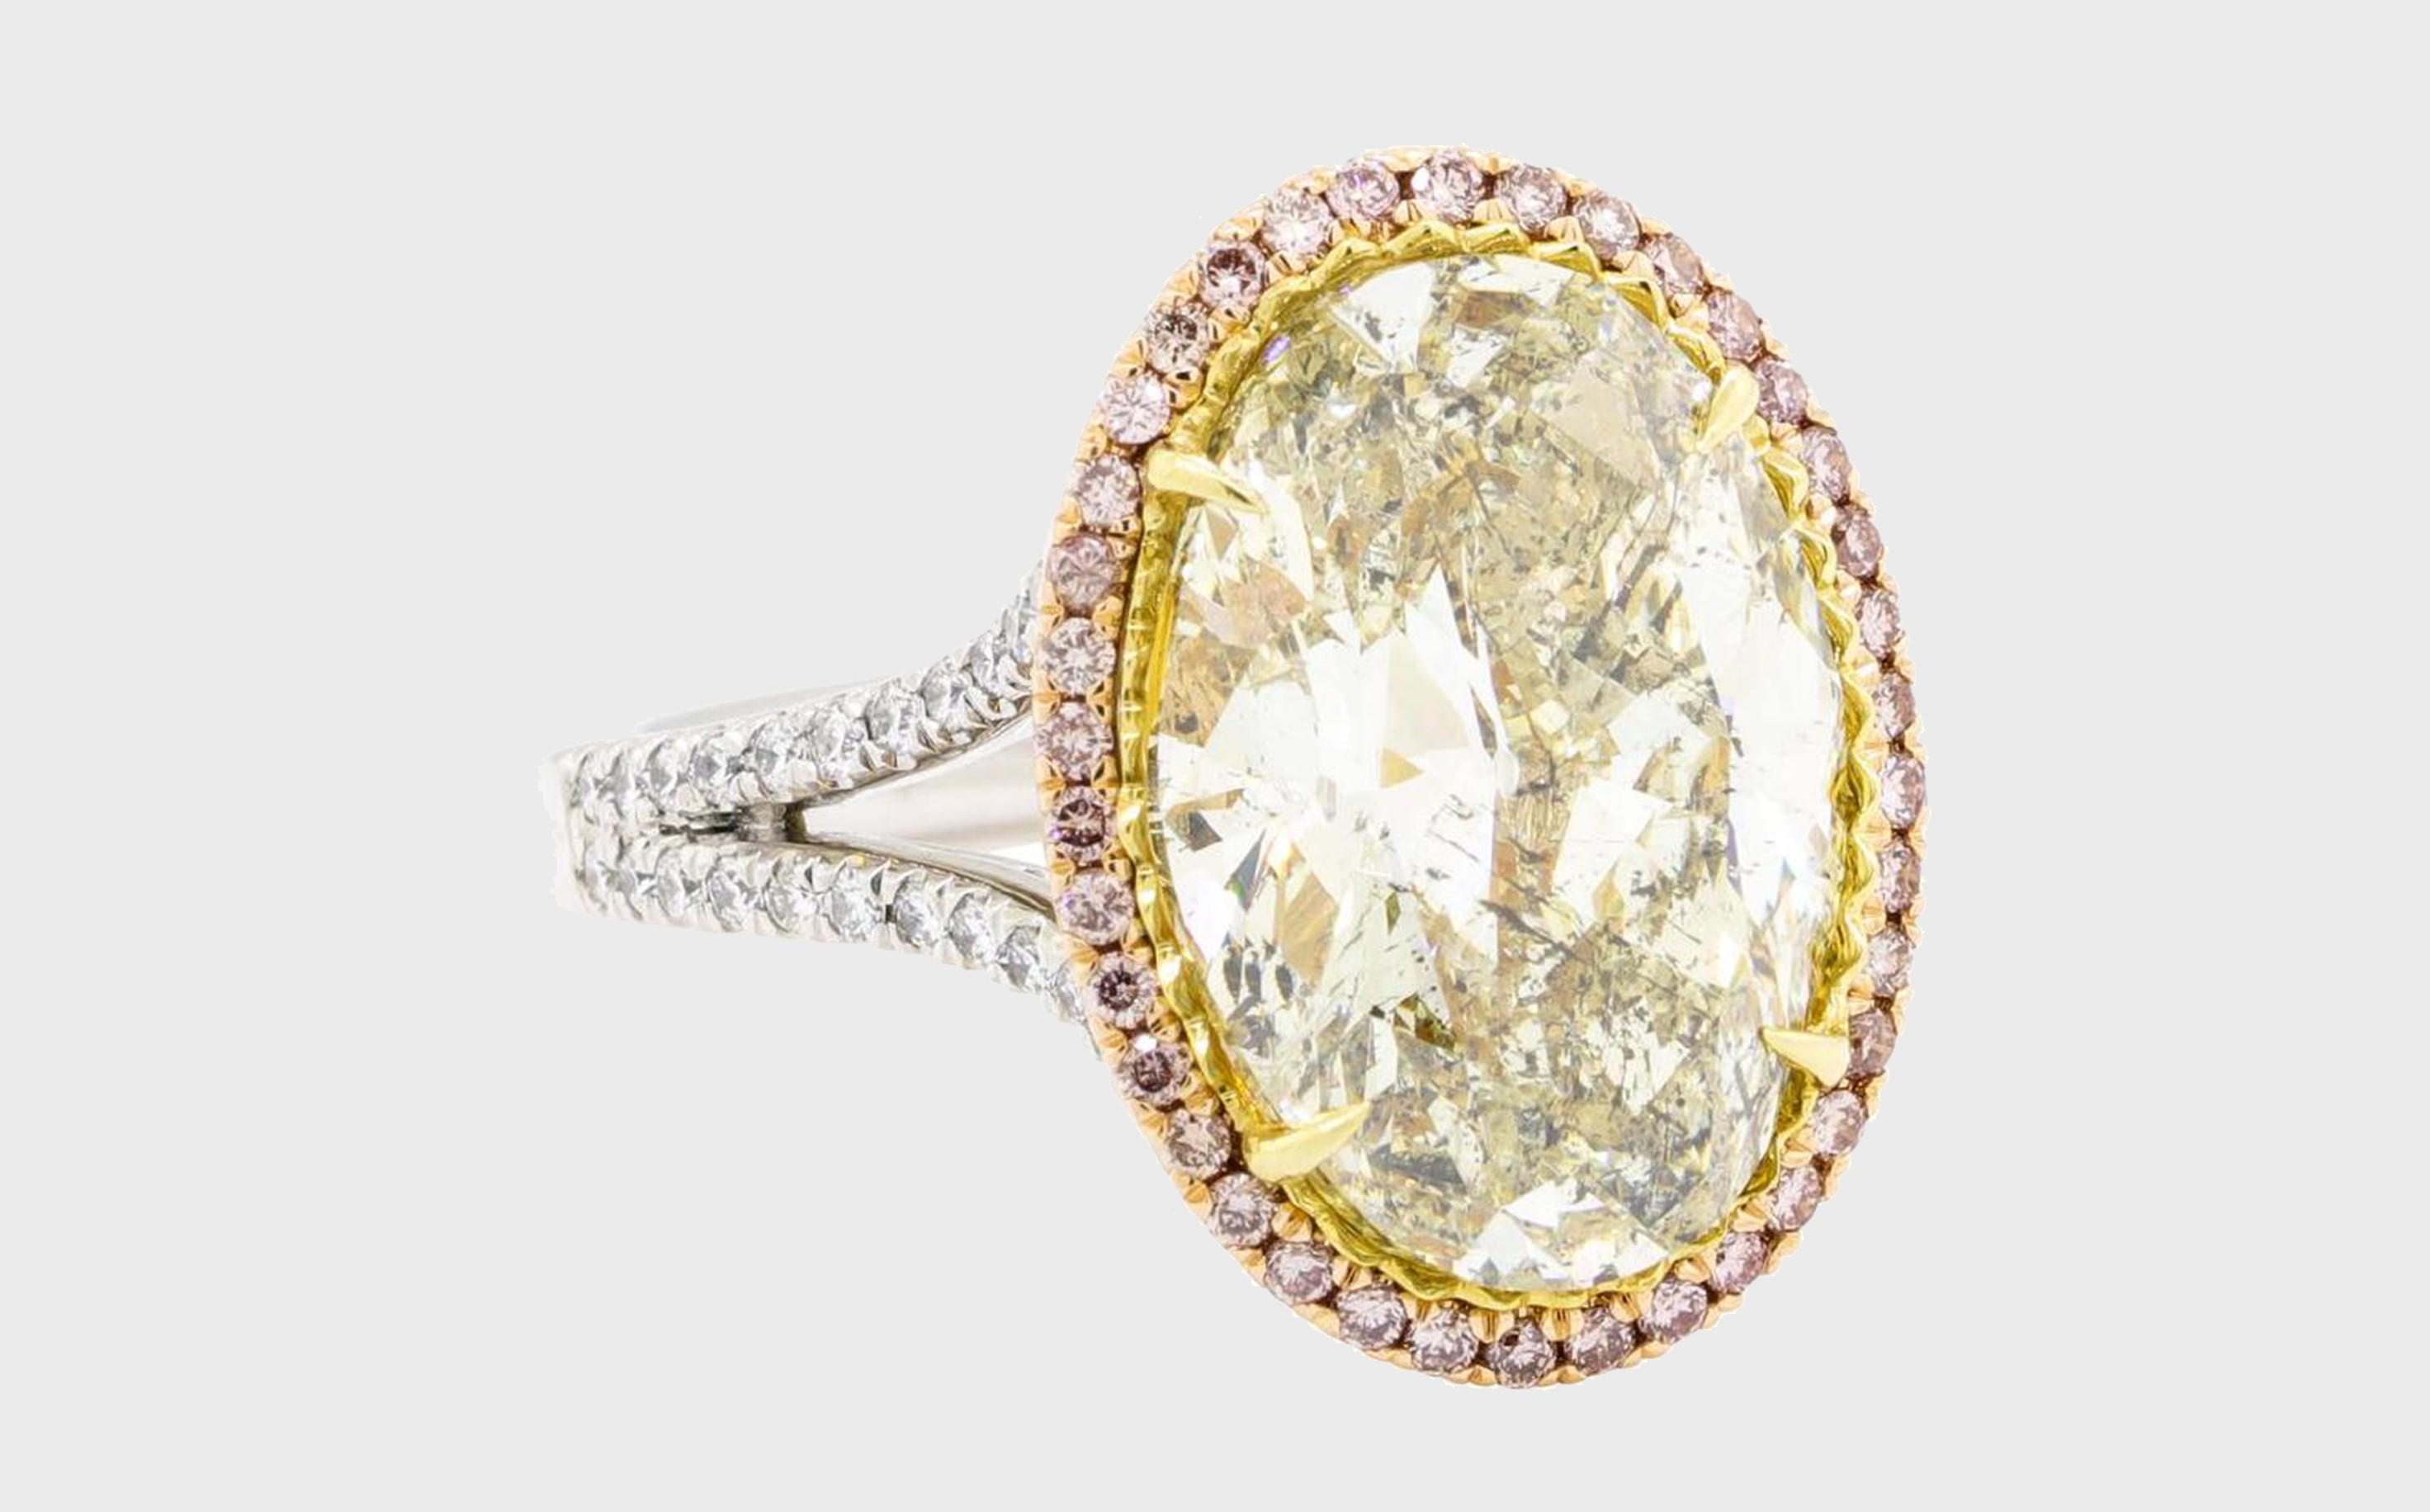 8.04 ctw Center Diamond Ring - Platinum and 18KT Rose